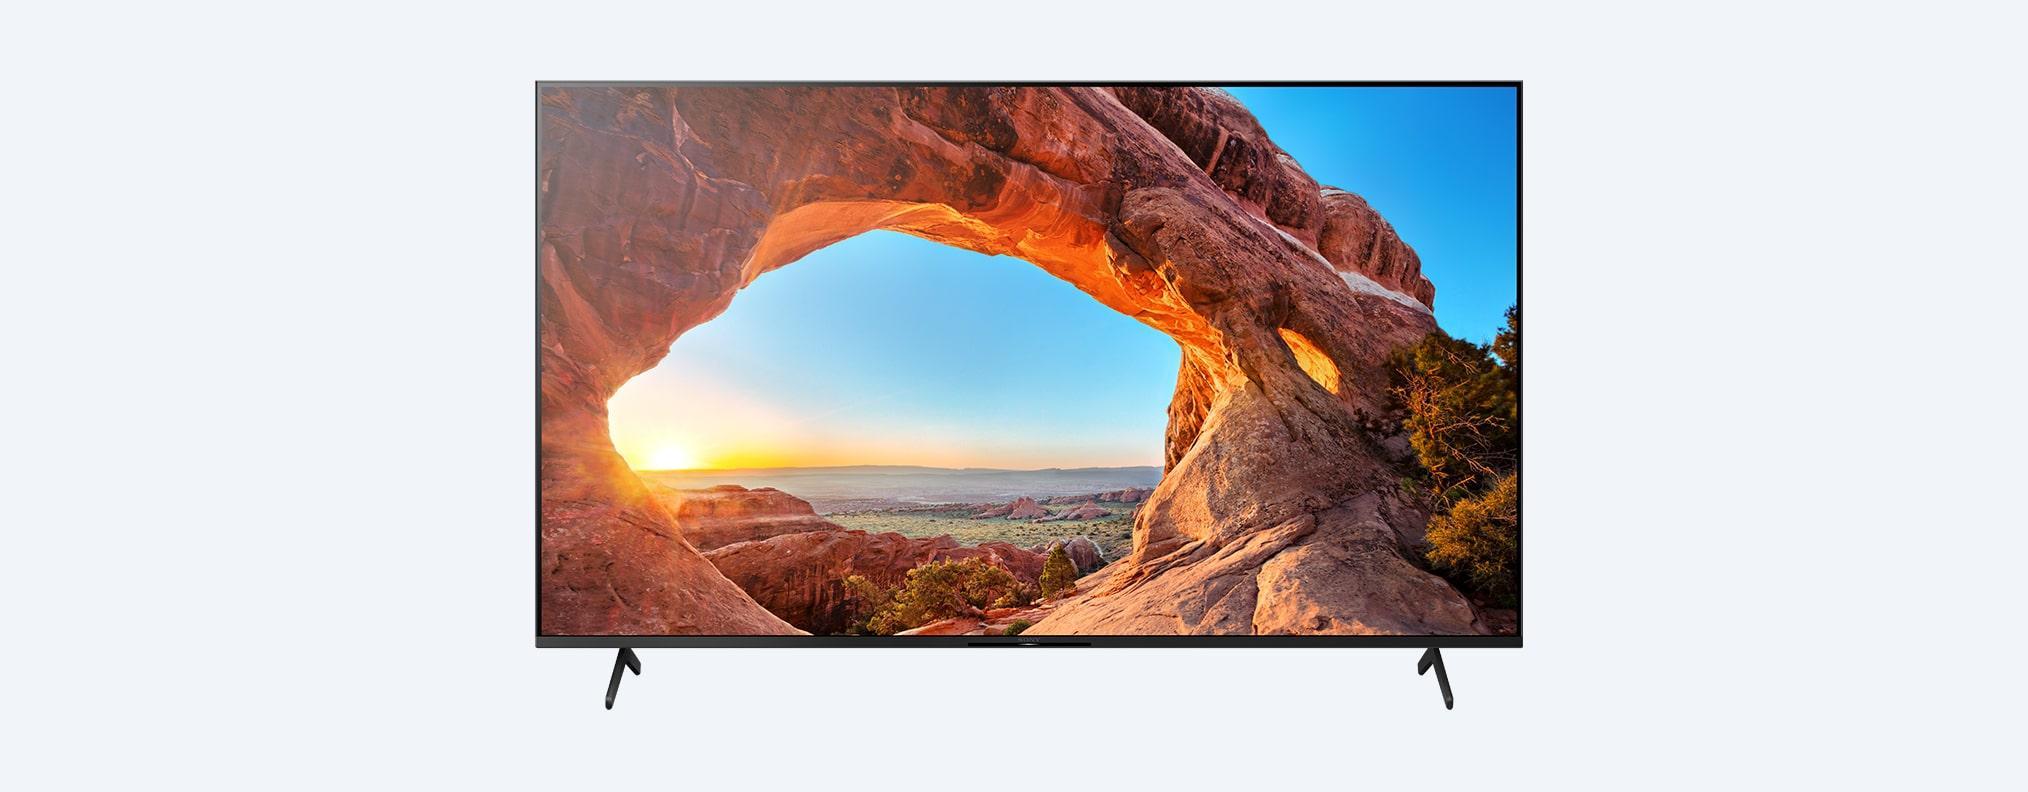 SonyX85j  4k Ultra Hd  High Dynamic Range (Hdr)  Smart Tv (Google Tv)